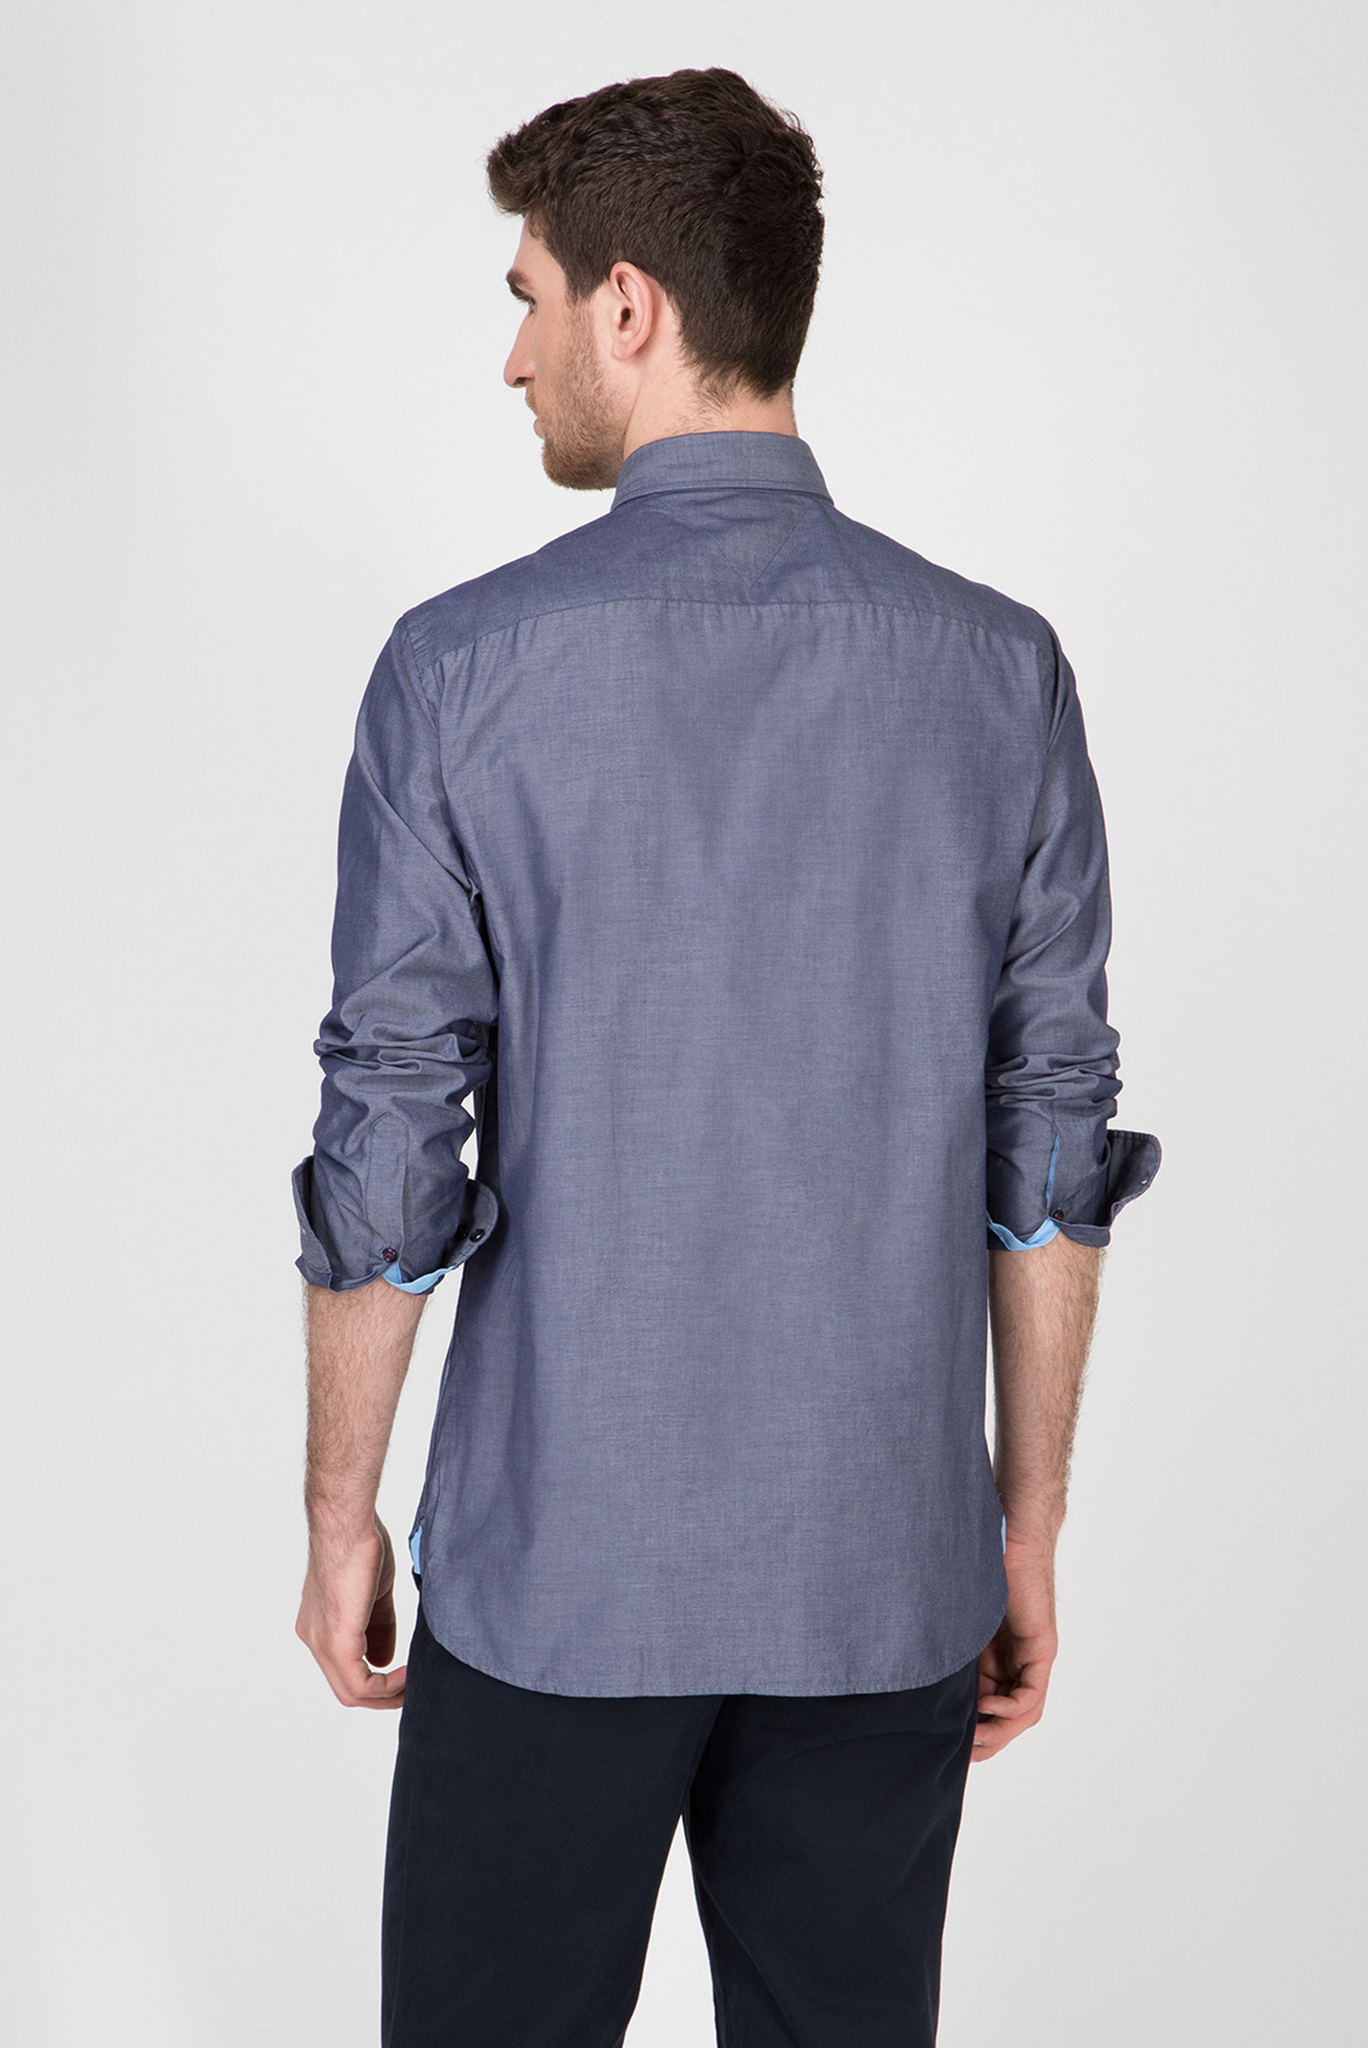 Мужская синяя рубашка NATURAL SOFT POPLIN Tommy Hilfiger